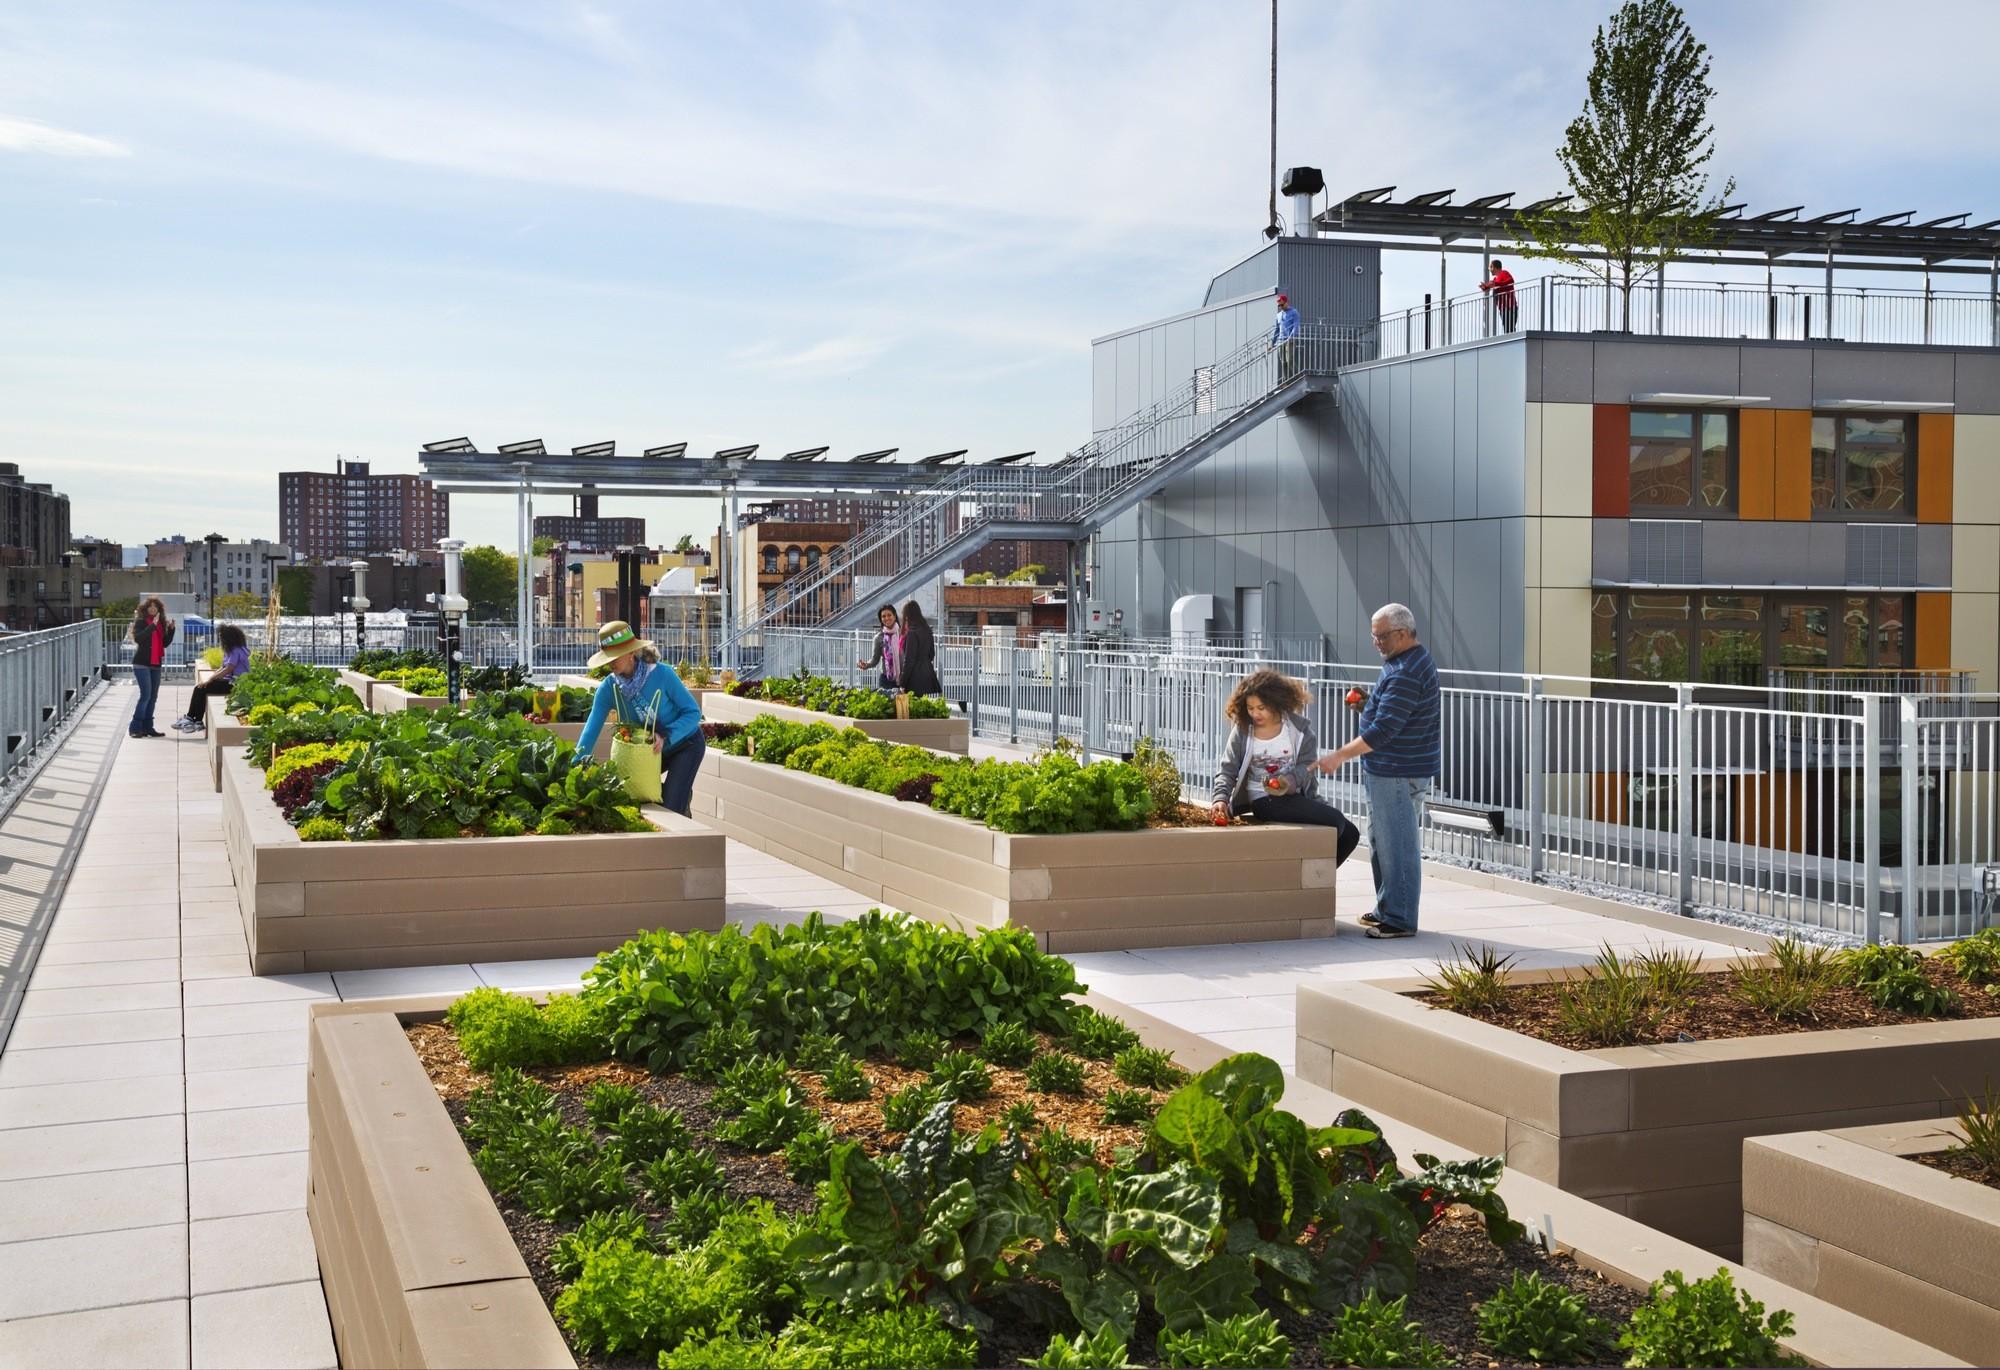 Call for Entries: Rudy Bruner Award for Urban Excellence 2015, RBA 2013 Winner: Via Verde / Dattner Architects + Grimshaw Architects. Image © David Sundberg